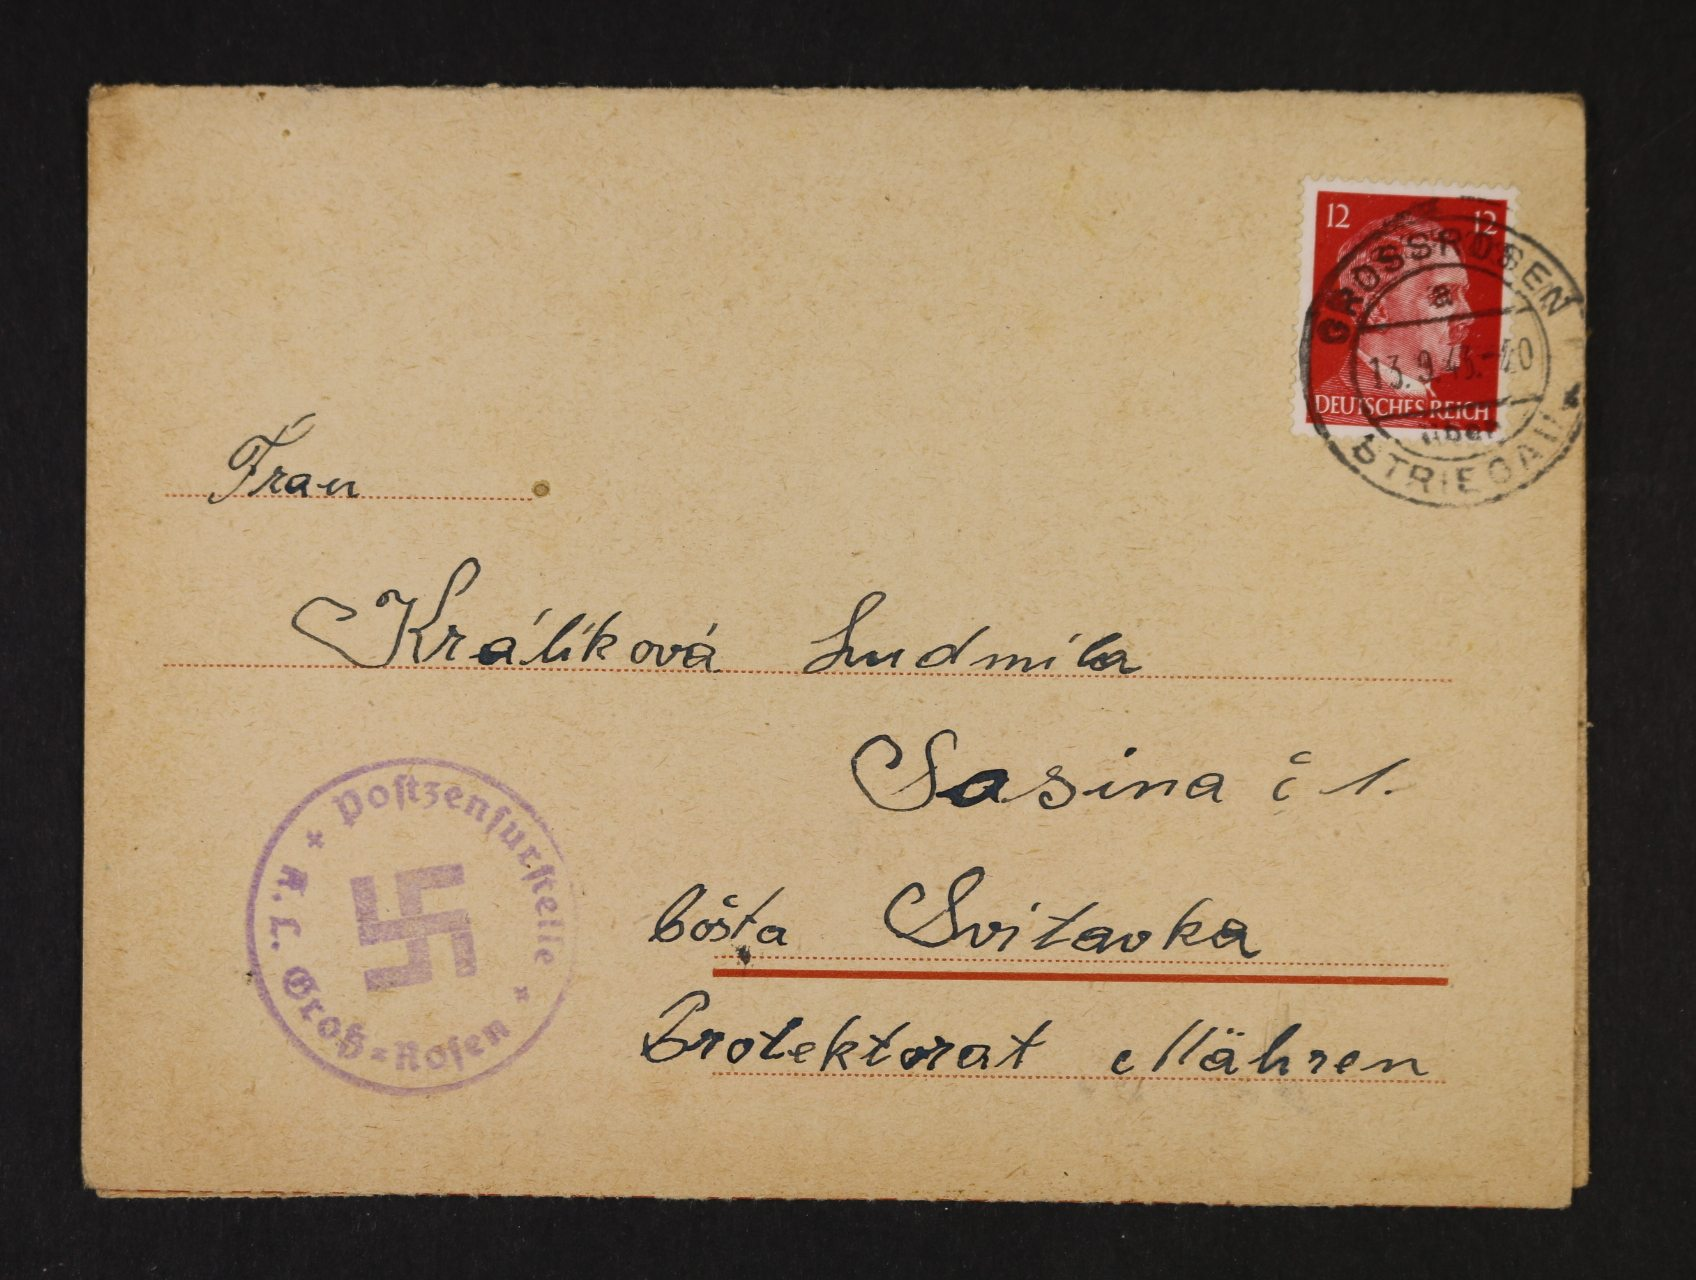 Grossrosen - skl. oficiální formulář frank. zn. 12pf A.H., pod. raz. GROSSROSEN STRIEGAU 13.9.43, velmi dobrá kvalita